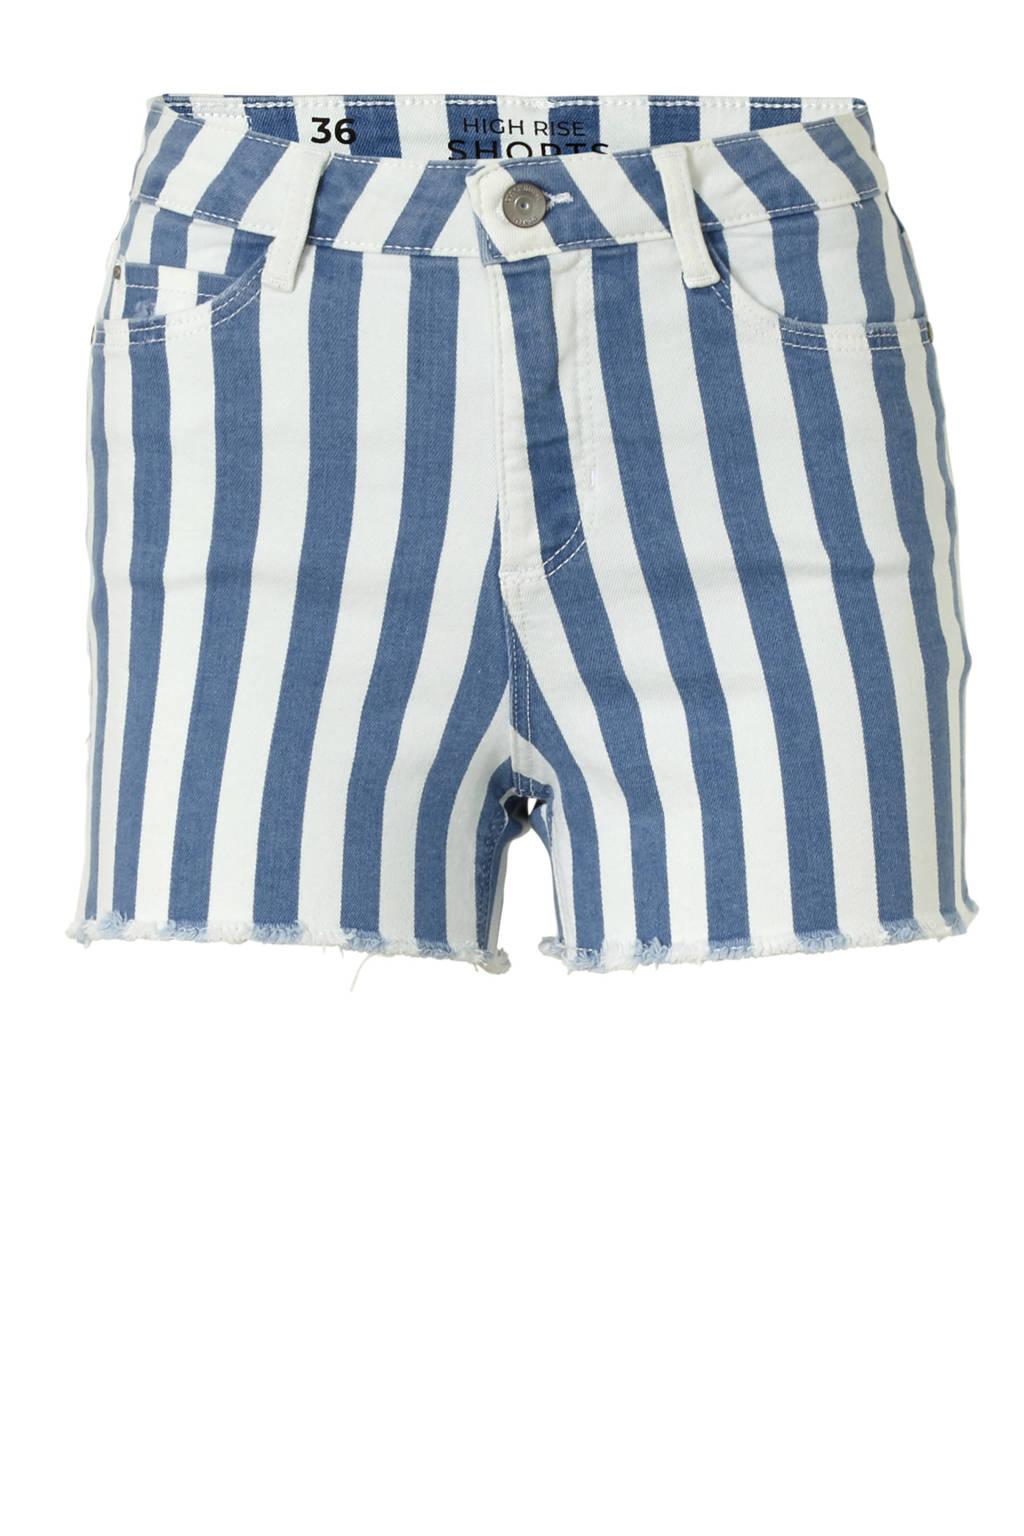 C&A Clockhouse gestreepte high waist slim fit jeans short, Blauw/ecru